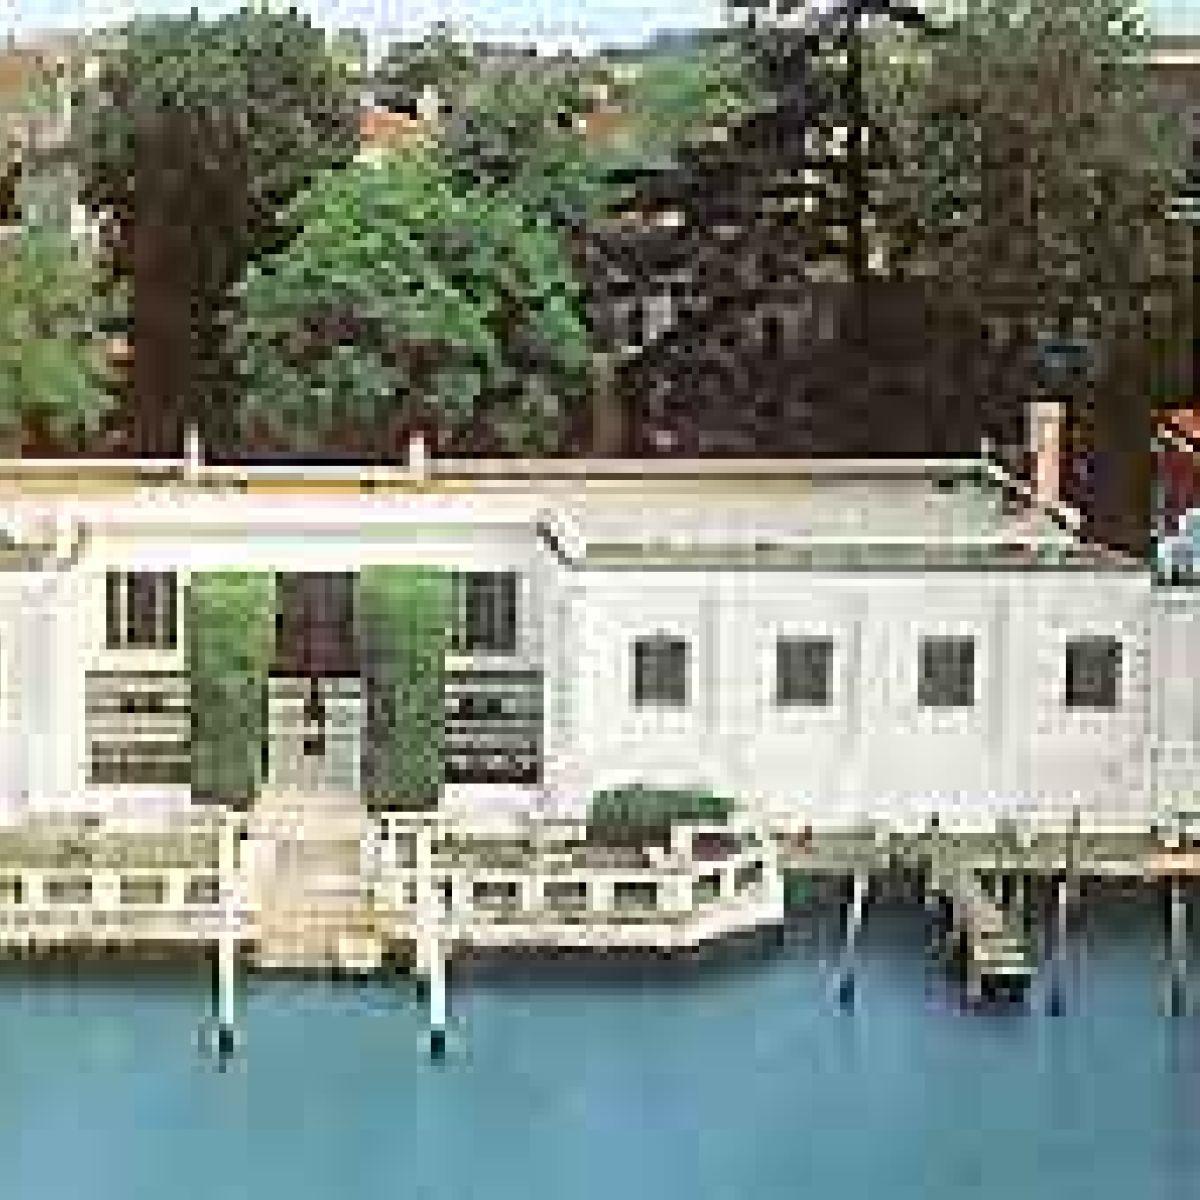 Guggenheim Museum Venice